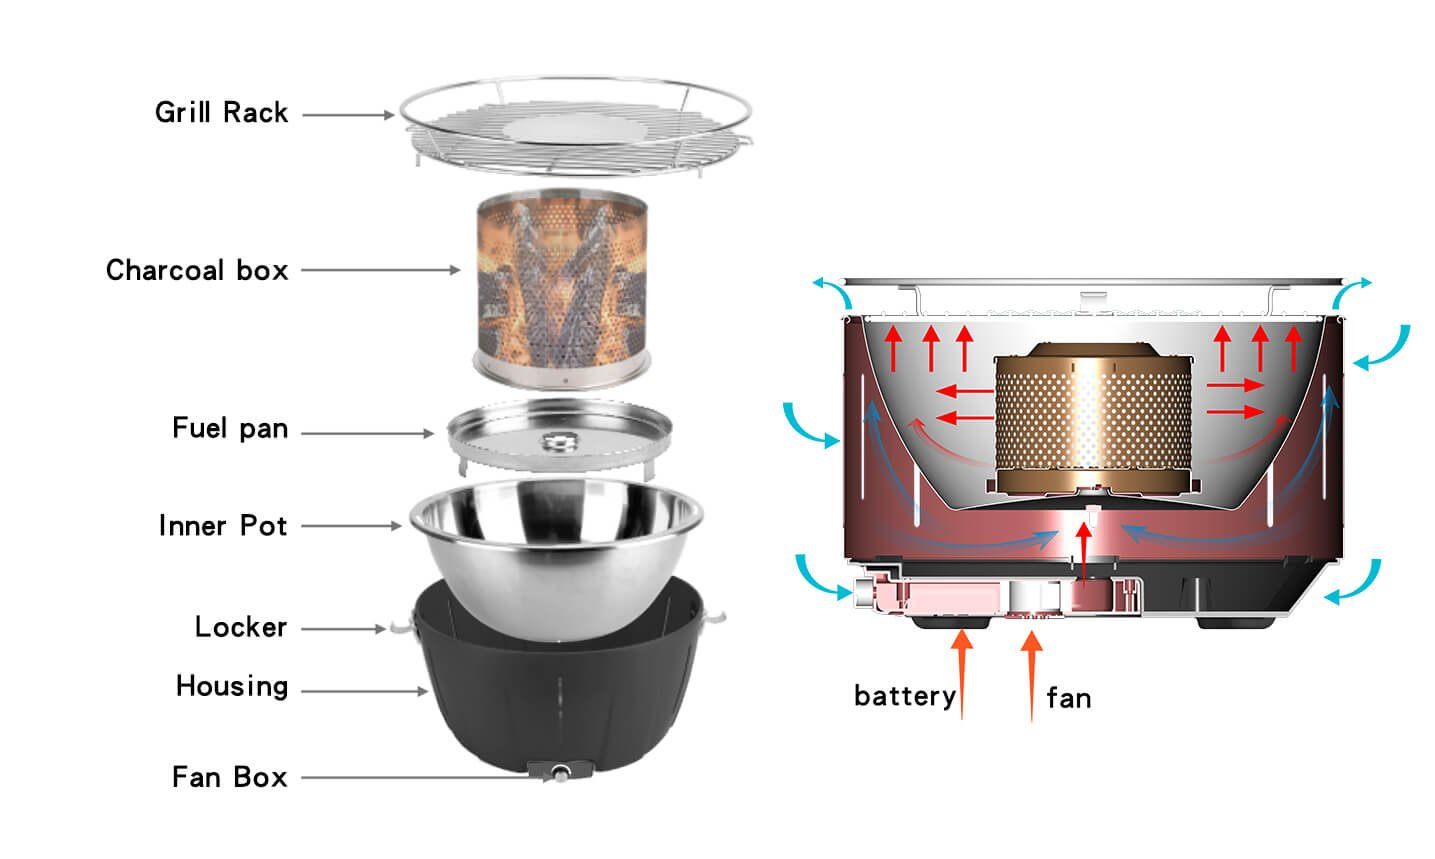 Rauchfreier Holzkohlegrill Vergleich : Aobosi rauchfreier holzkohlegrill mit aktivbelüftung ventilator